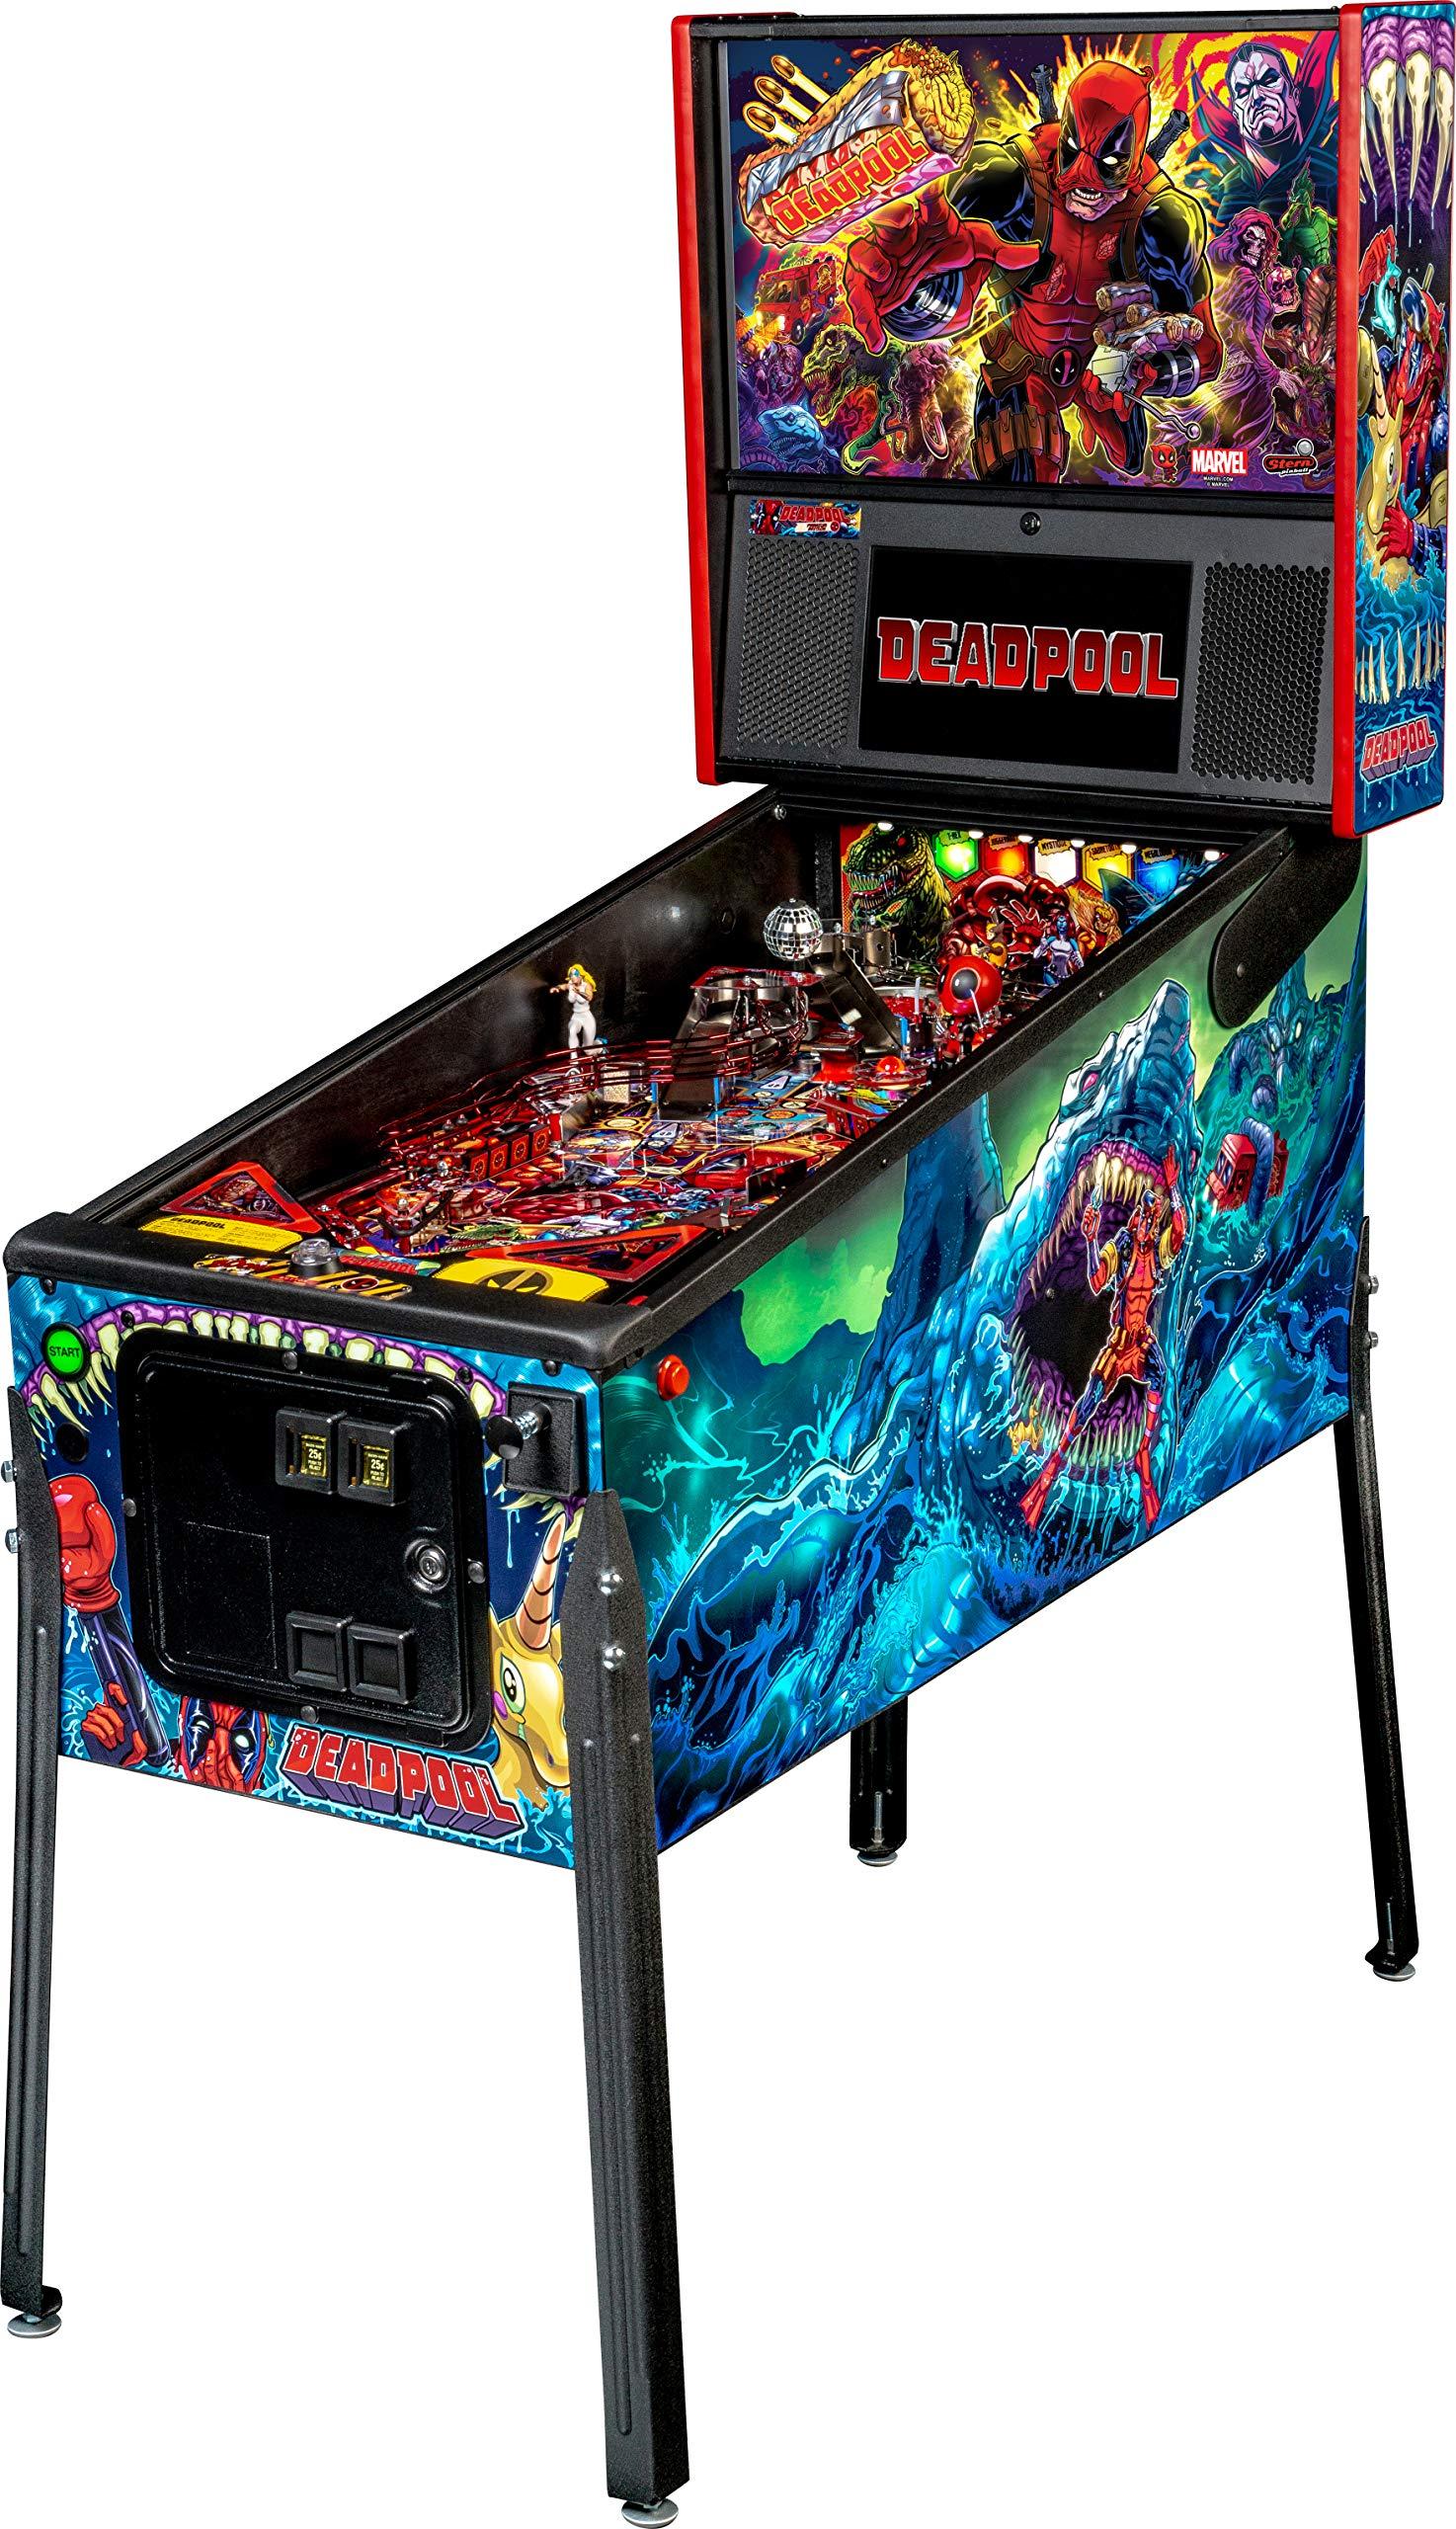 Stern Pinball Deadpool Arcade Pinball Machine, Premium Edition by Stern Pinball